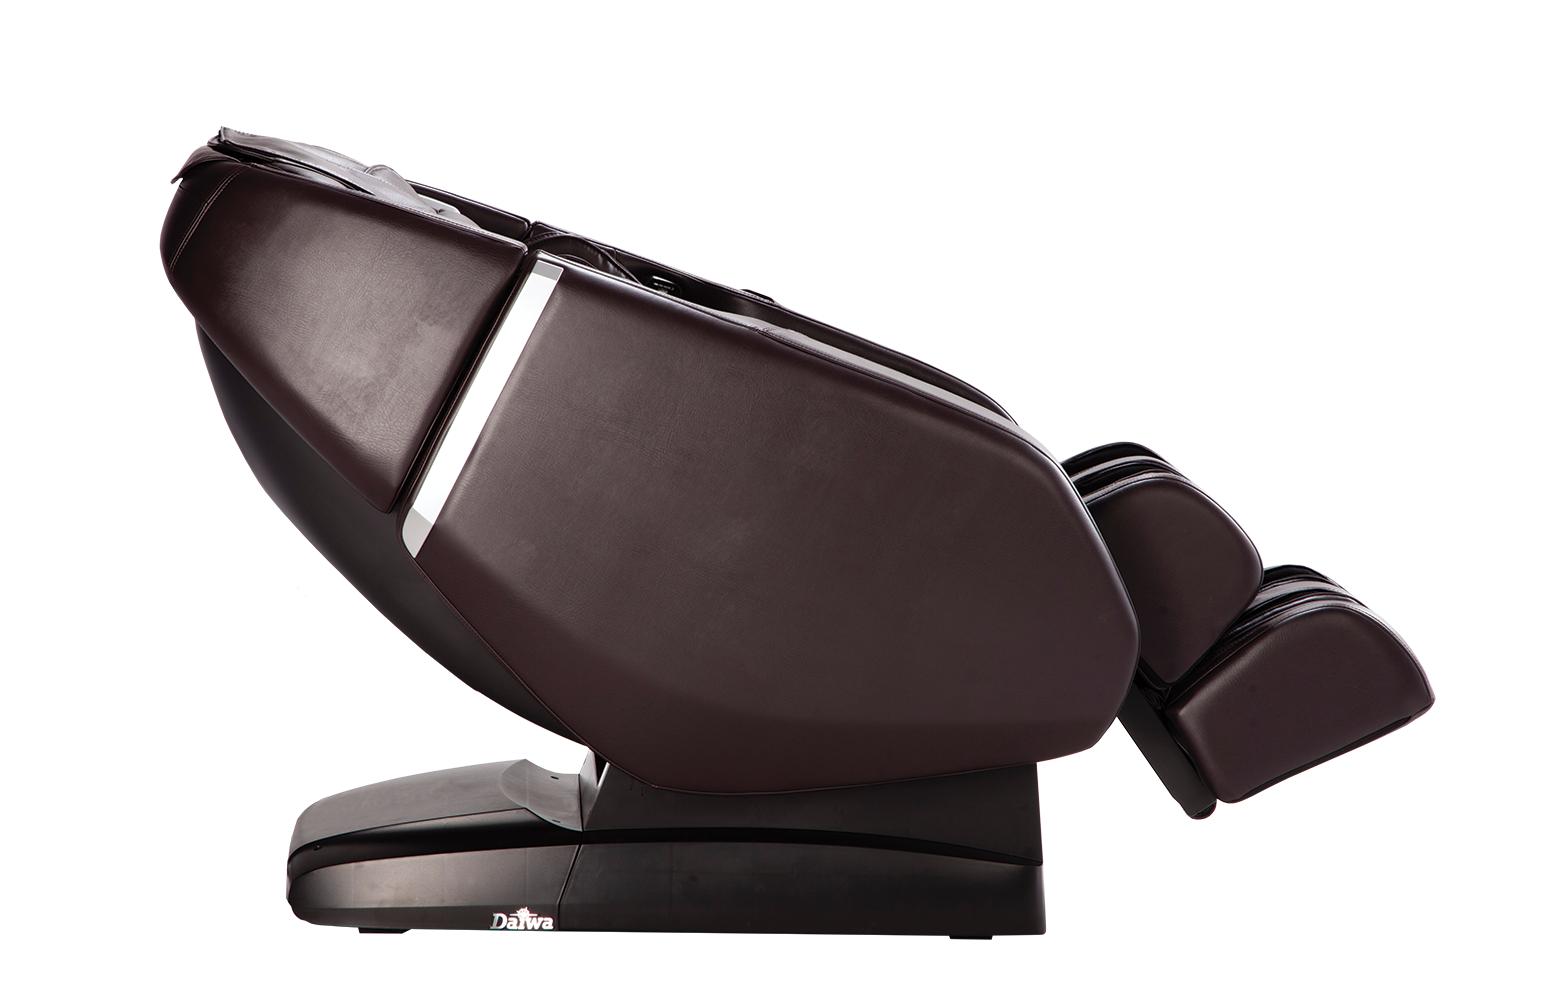 Majesty Massage Chair